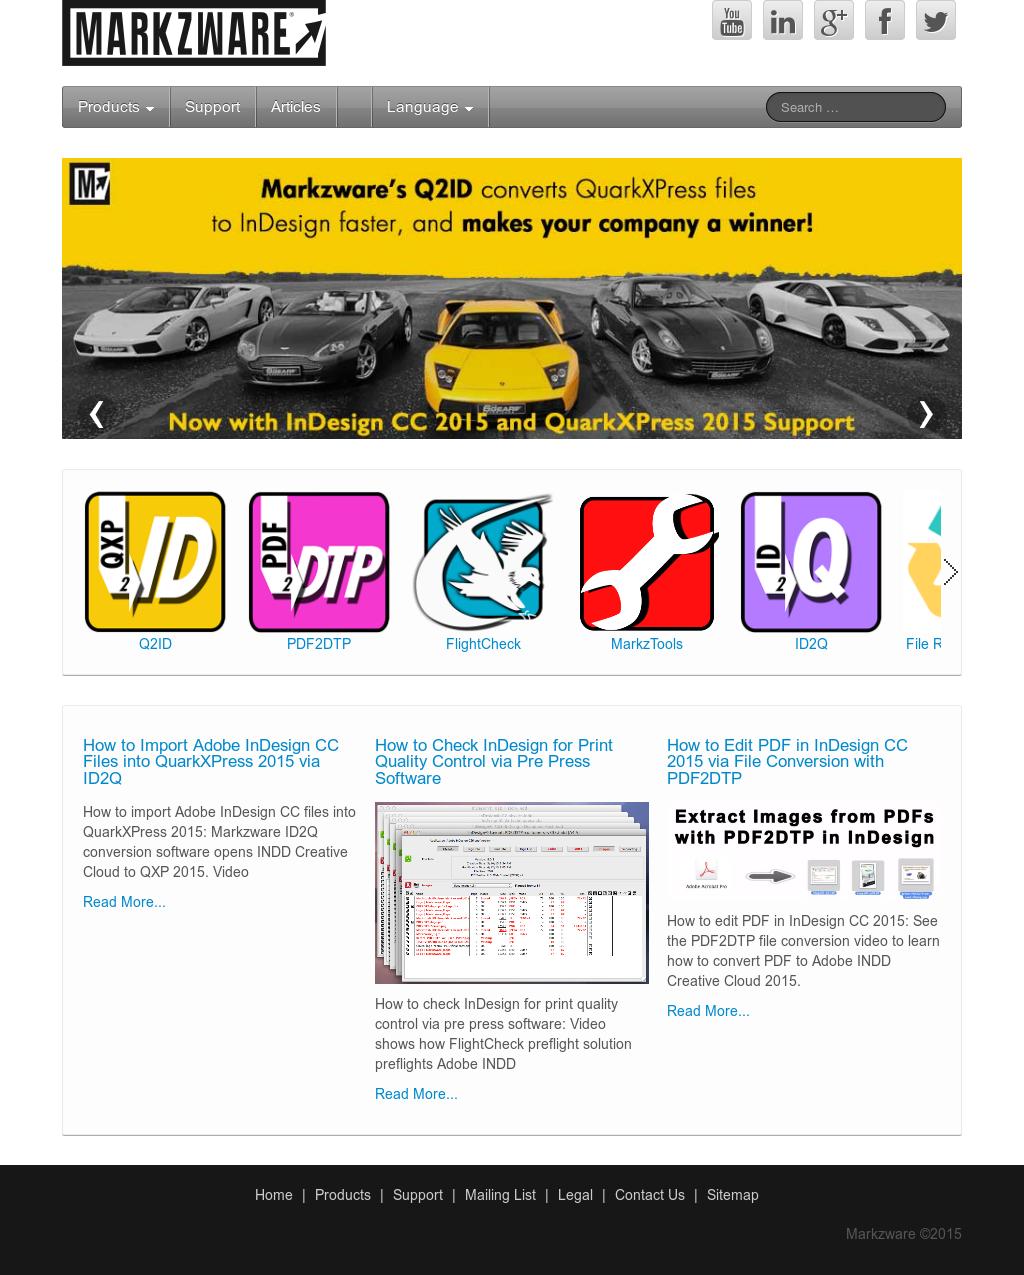 Markzware Competitors, Revenue and Employees - Owler Company Profile